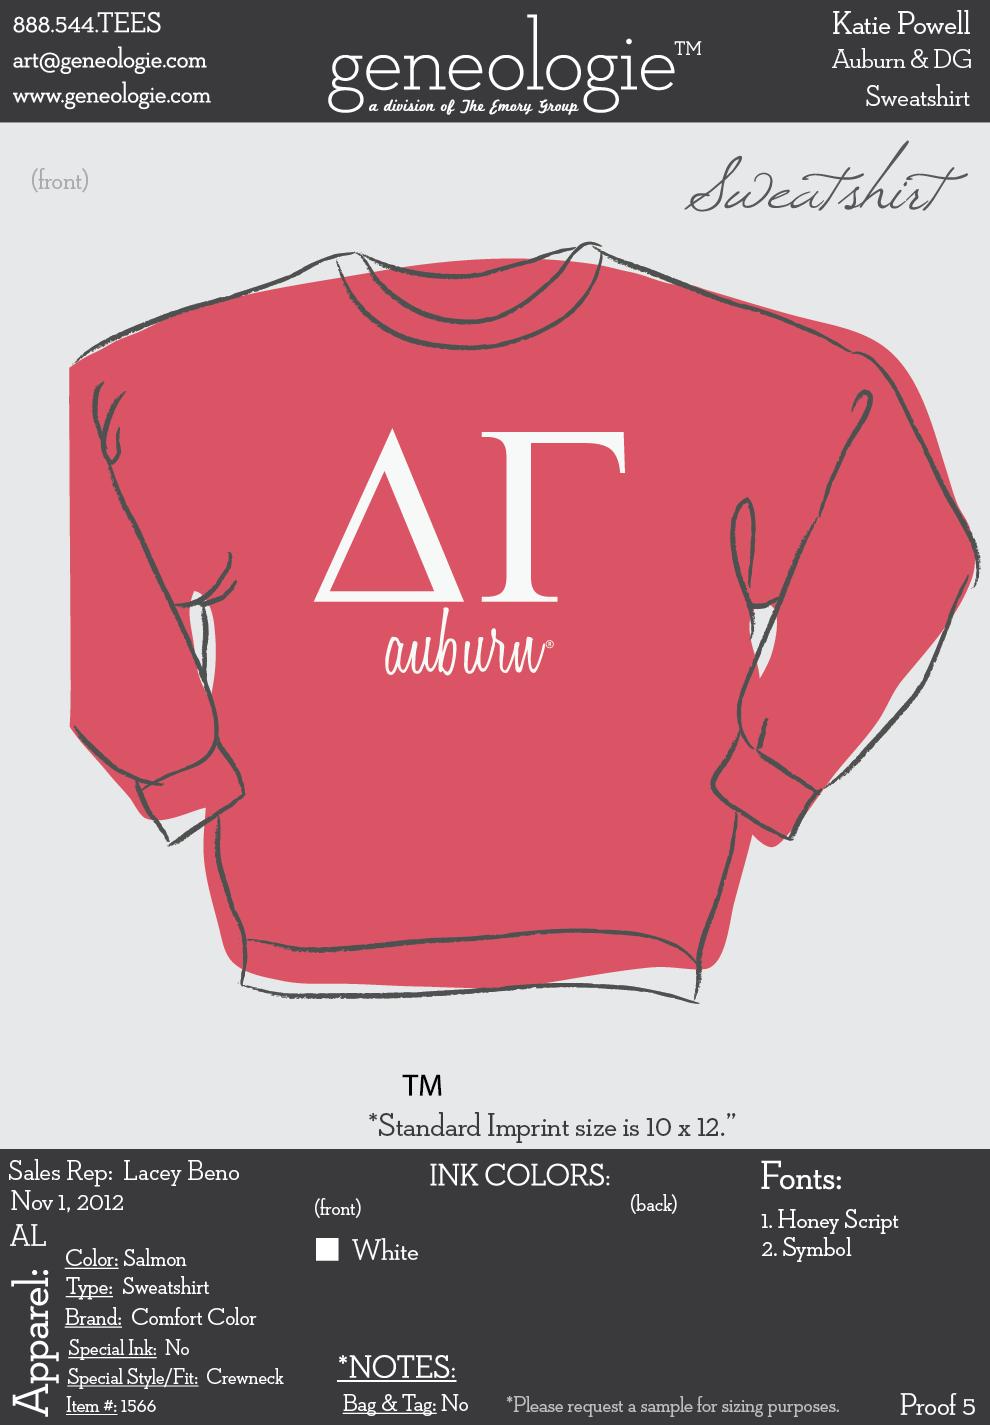 Delta Gamma Sweatshirt These Are Cute With Adpi Letters Of Course Zeta Tau Alpha Shirts Delta Zeta Sorority Delta Gamma [ 1425 x 990 Pixel ]